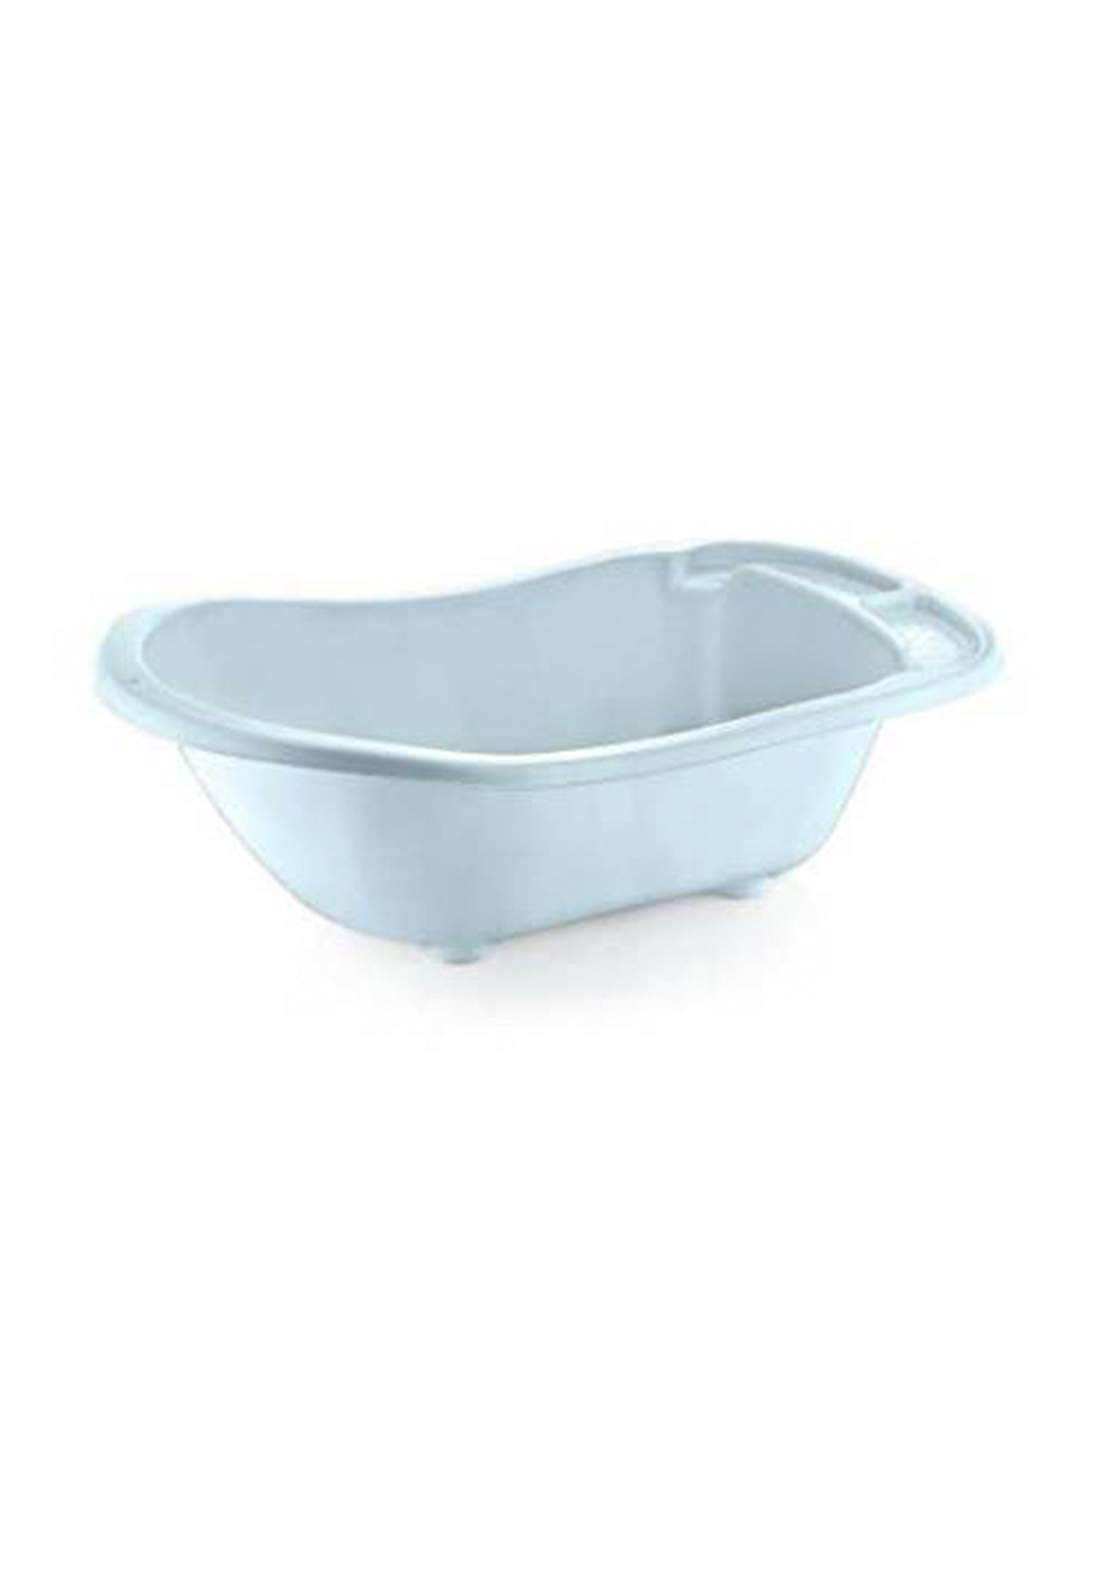 Babyjem 241 Bath Tub حوض استحمام للاطفال